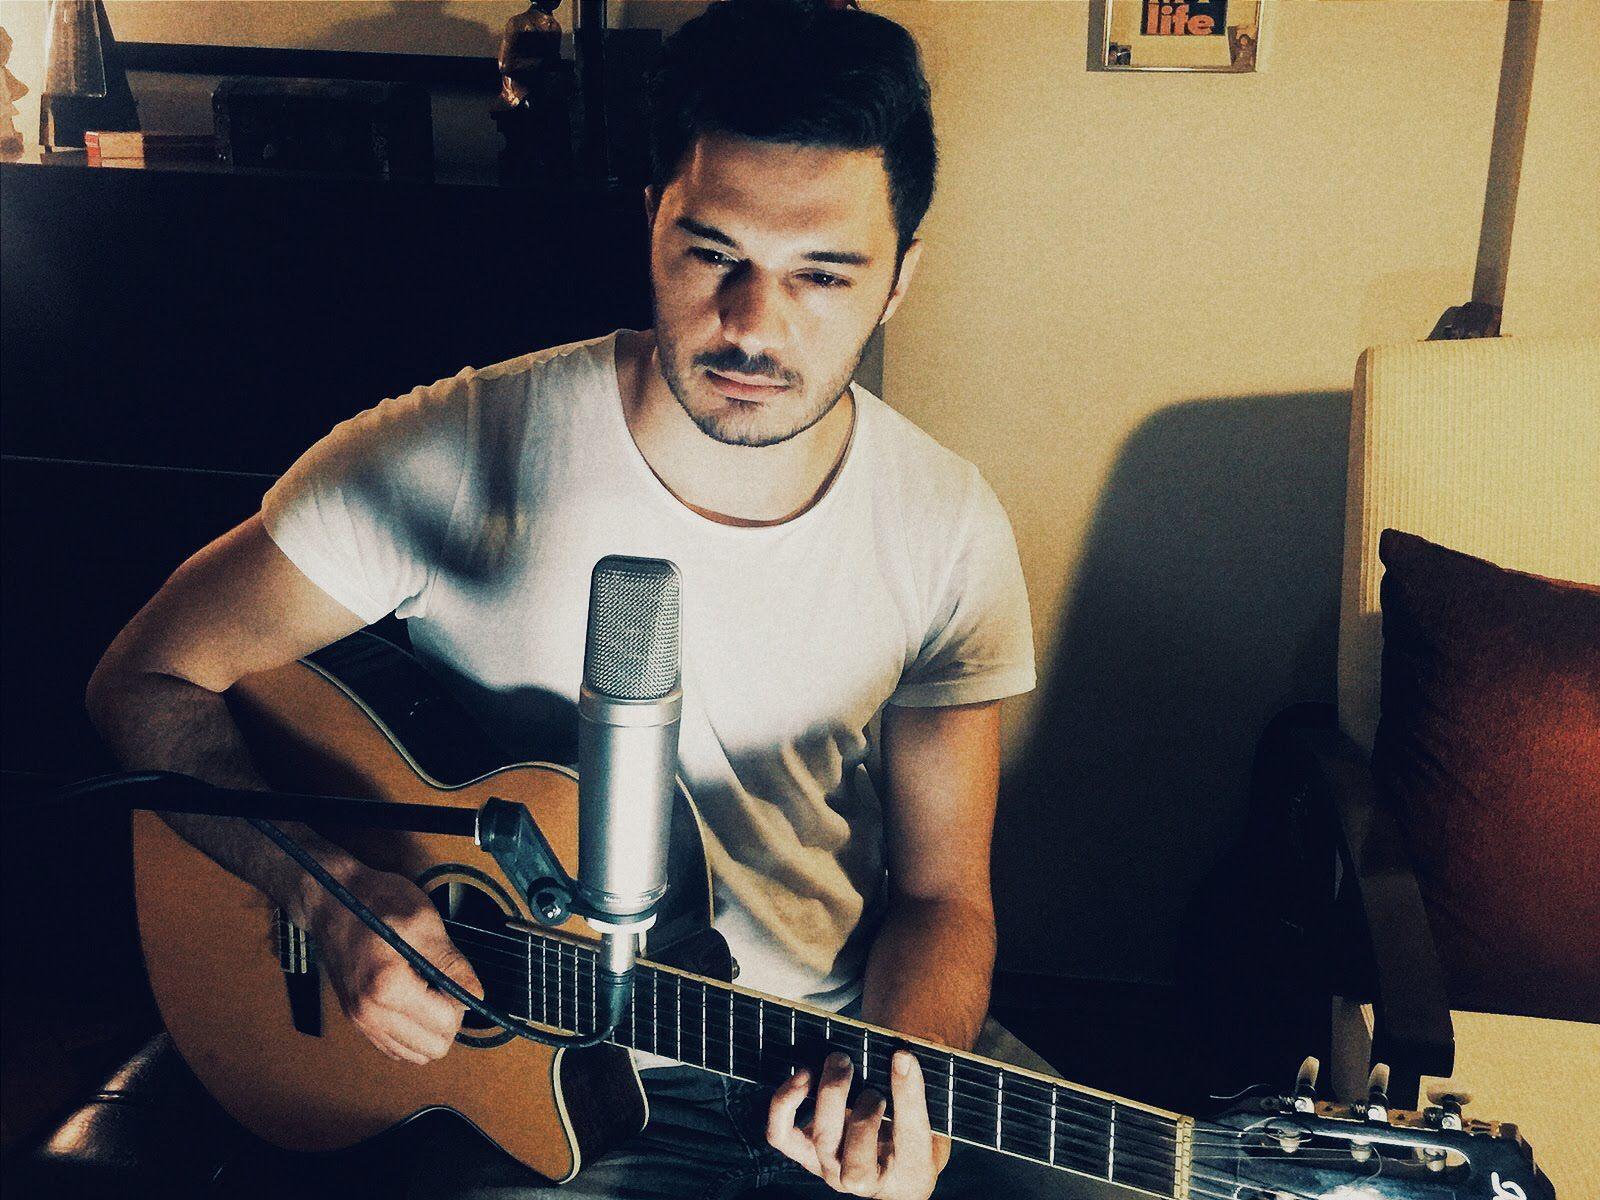 Ilyas Yalcintas Icimdeki Duman Pop Muzik Youtube Muzik